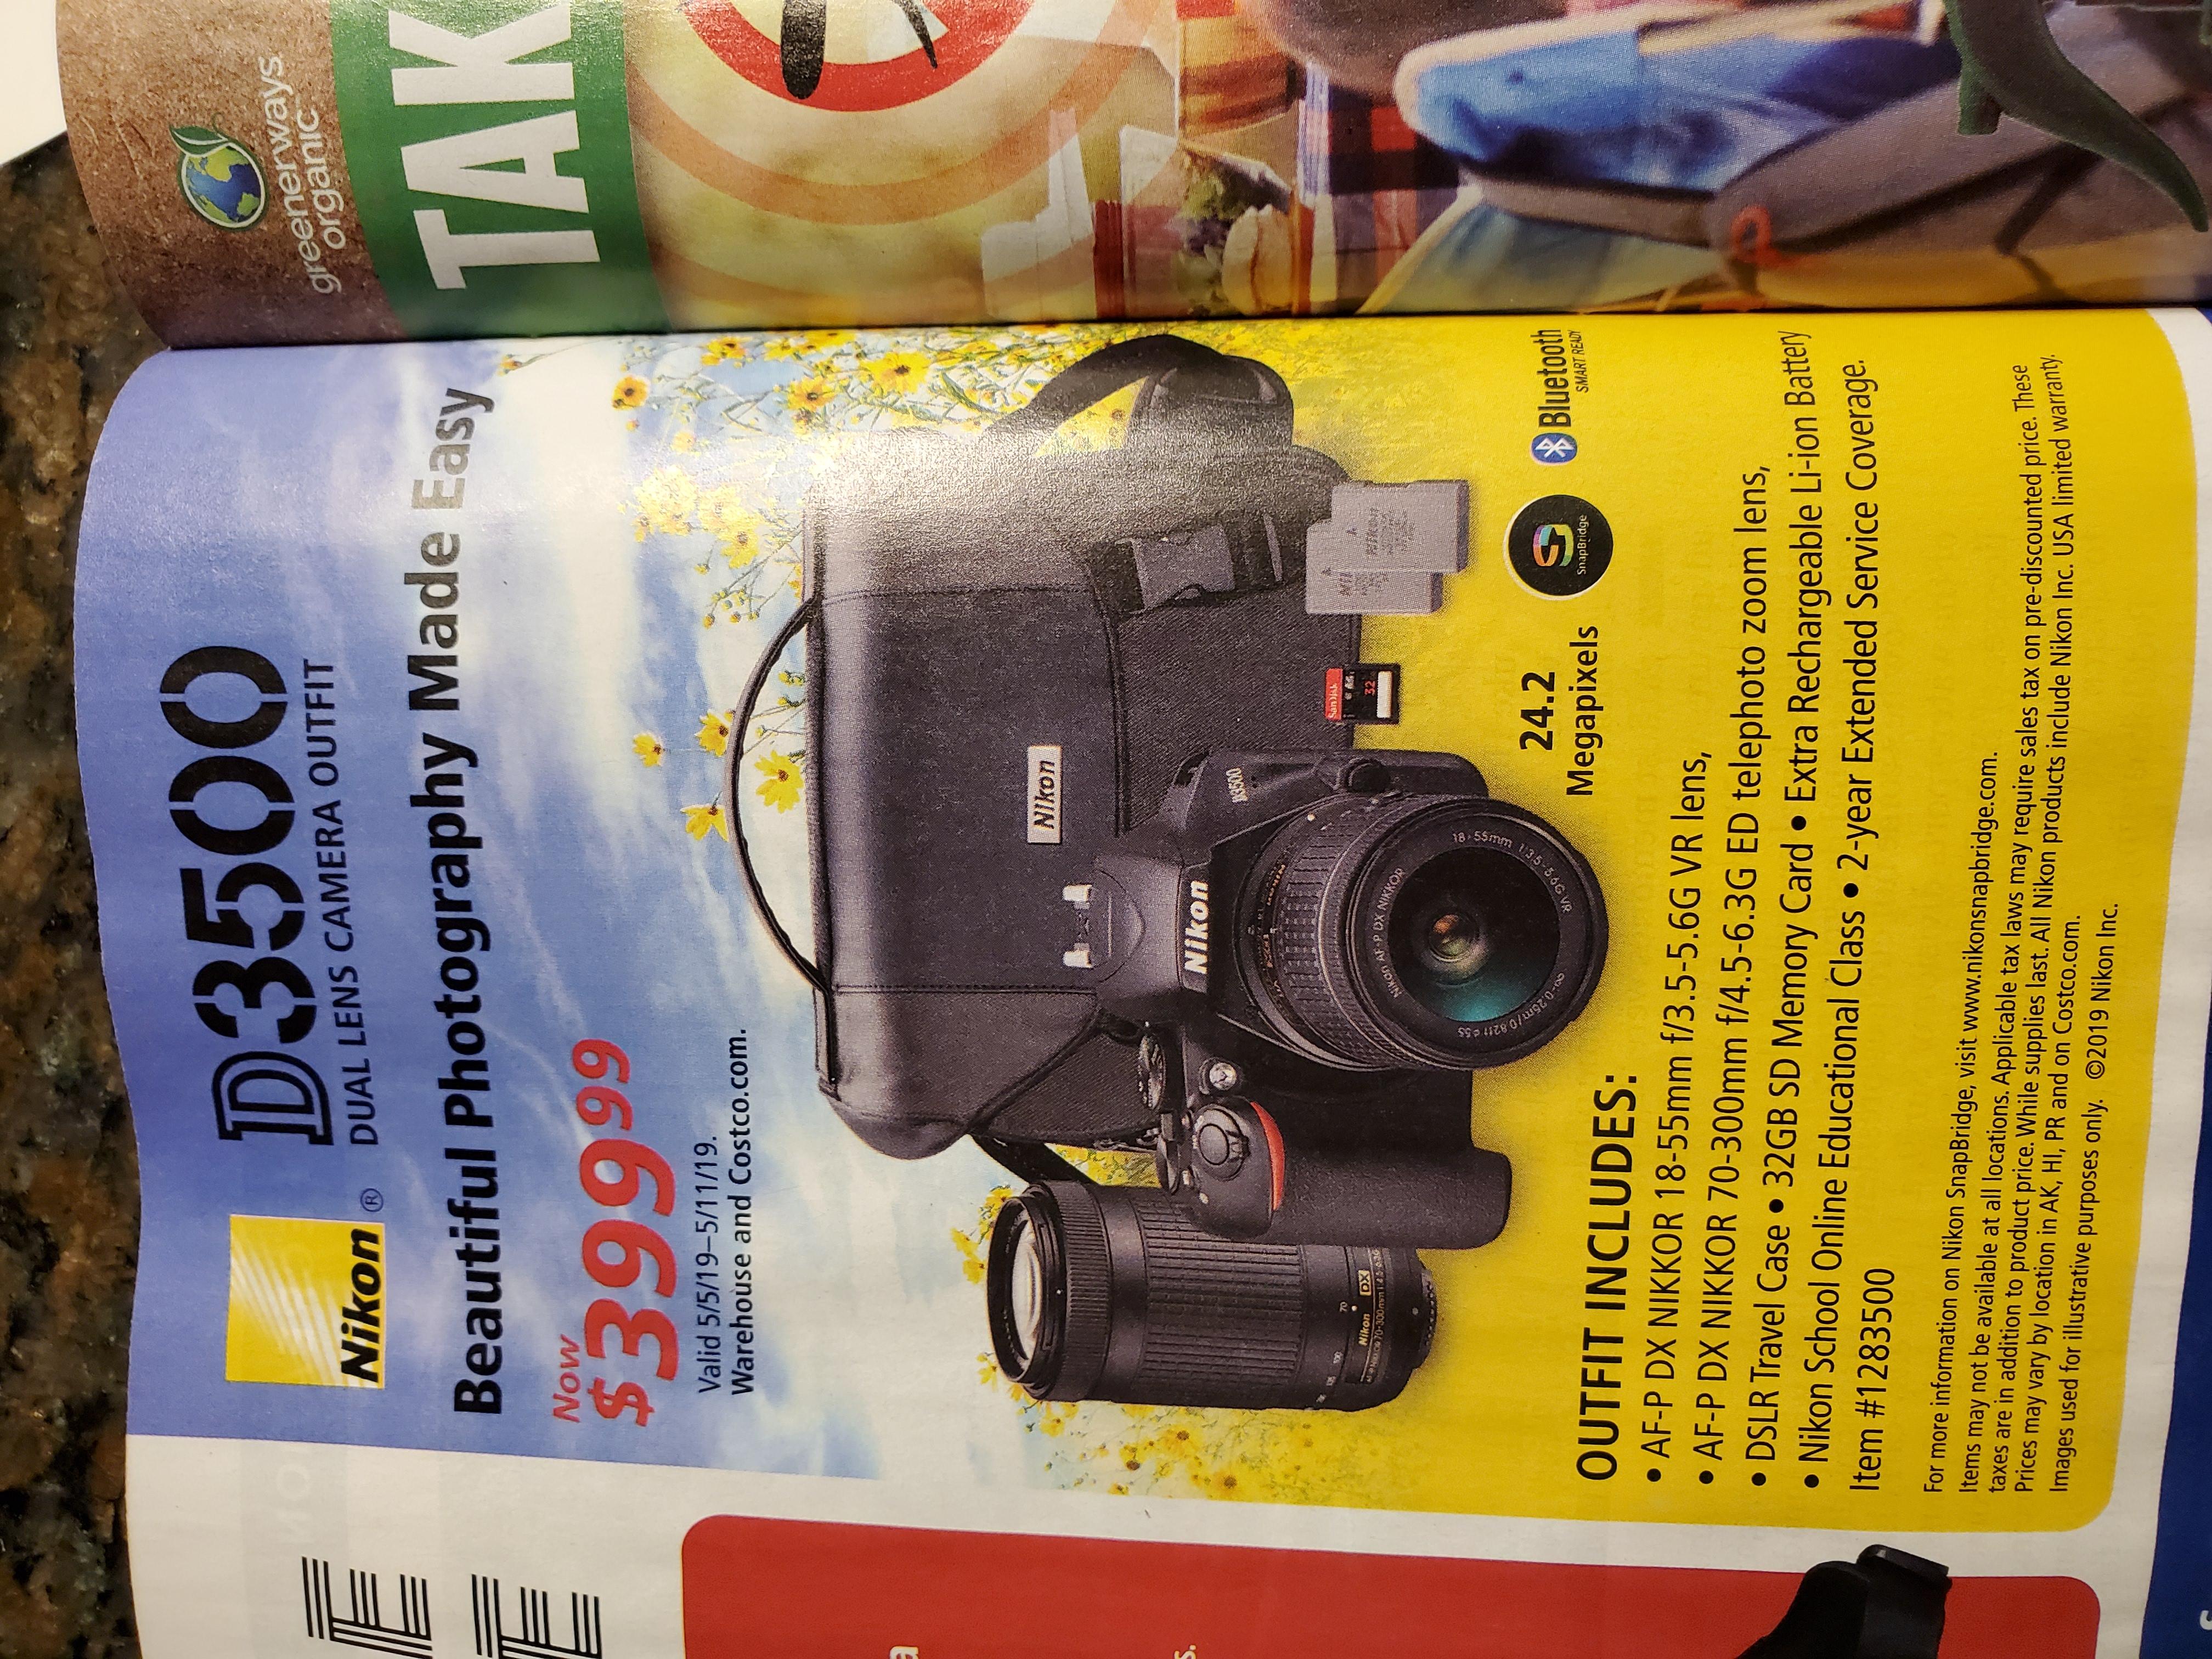 Nikon D3500 + 18-55 mm + 70-300 mm Nikon lenses+ Extra